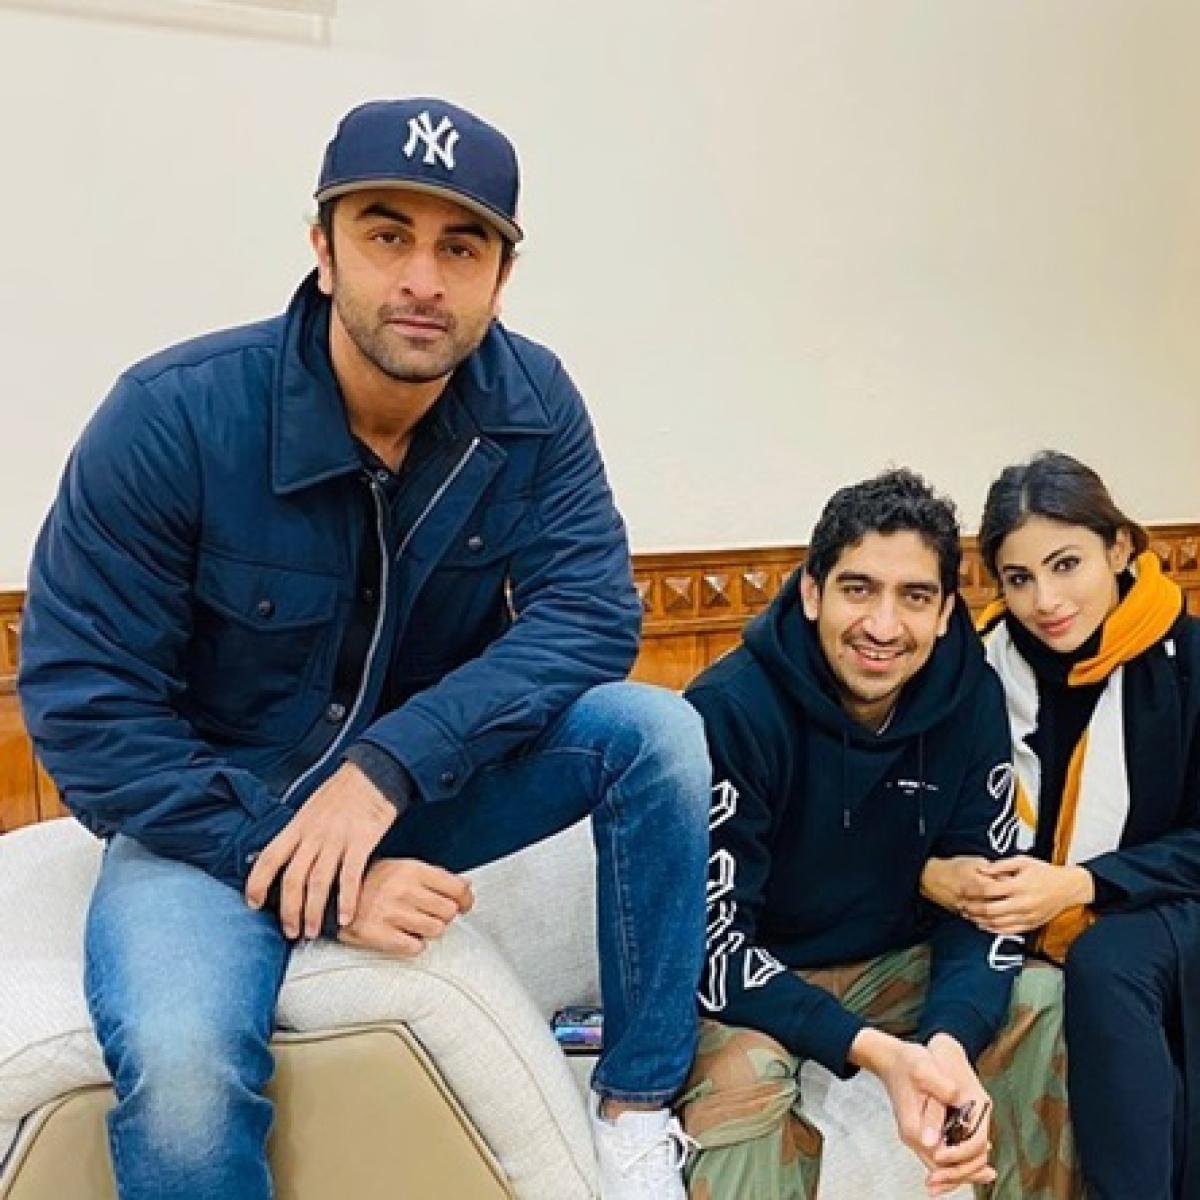 Mouni Roy shares 'warm' picture with 'Brahmastra' co-star Ranbir Kapoor, director Ayan Mukerji